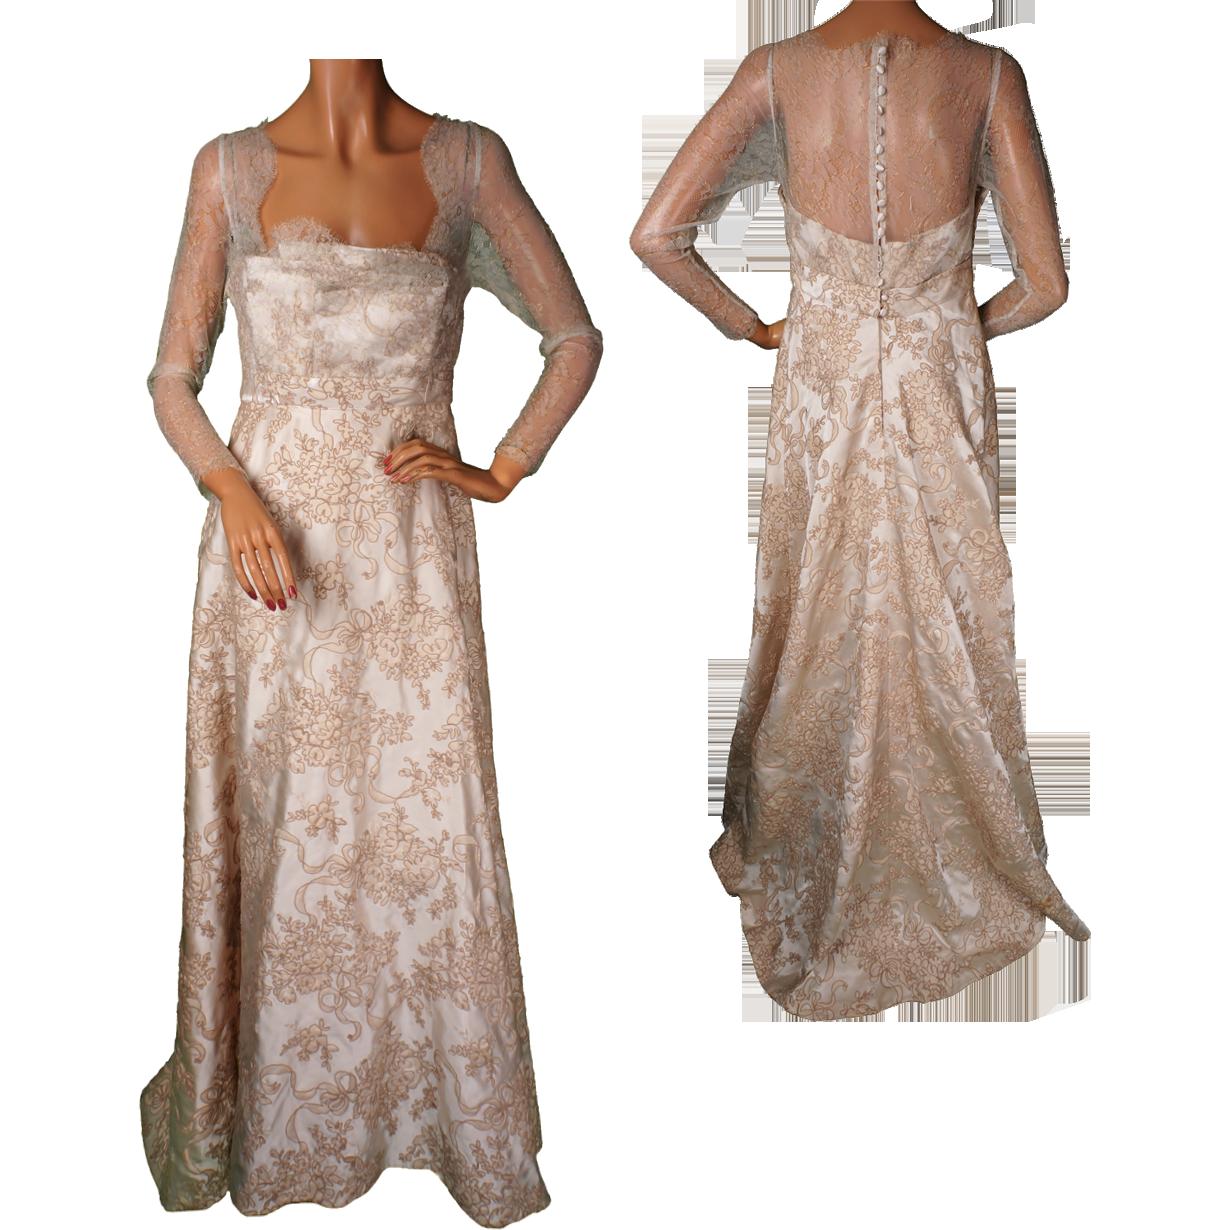 Vintage Wedding Dresses Canada: Vintage 60s Wedding Dress Lace & Silk Brocade Size M From